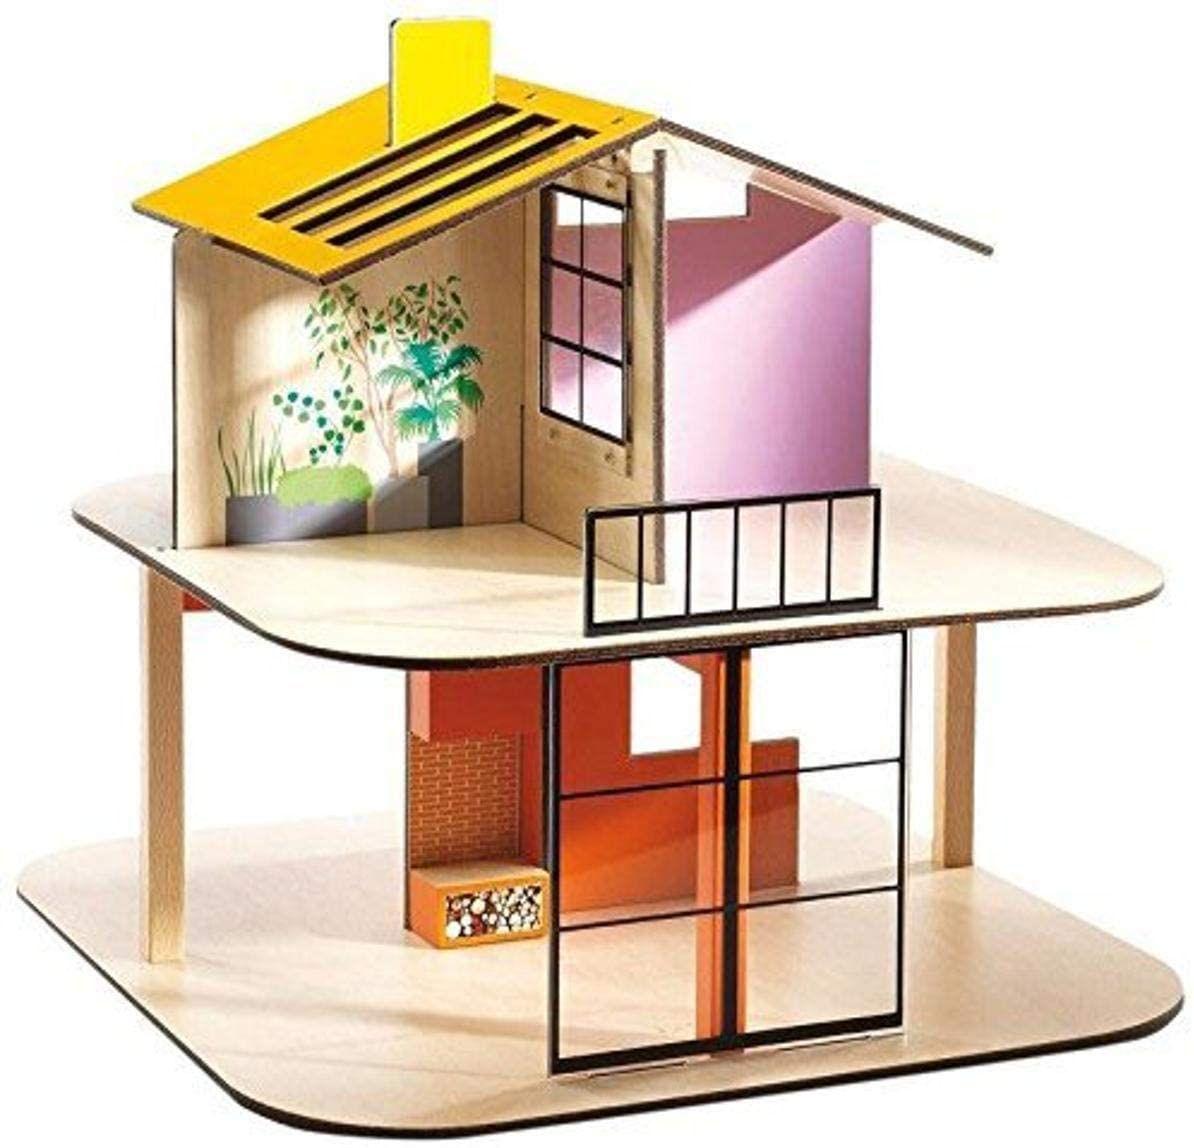 DJECO Color Dollhouse Playset